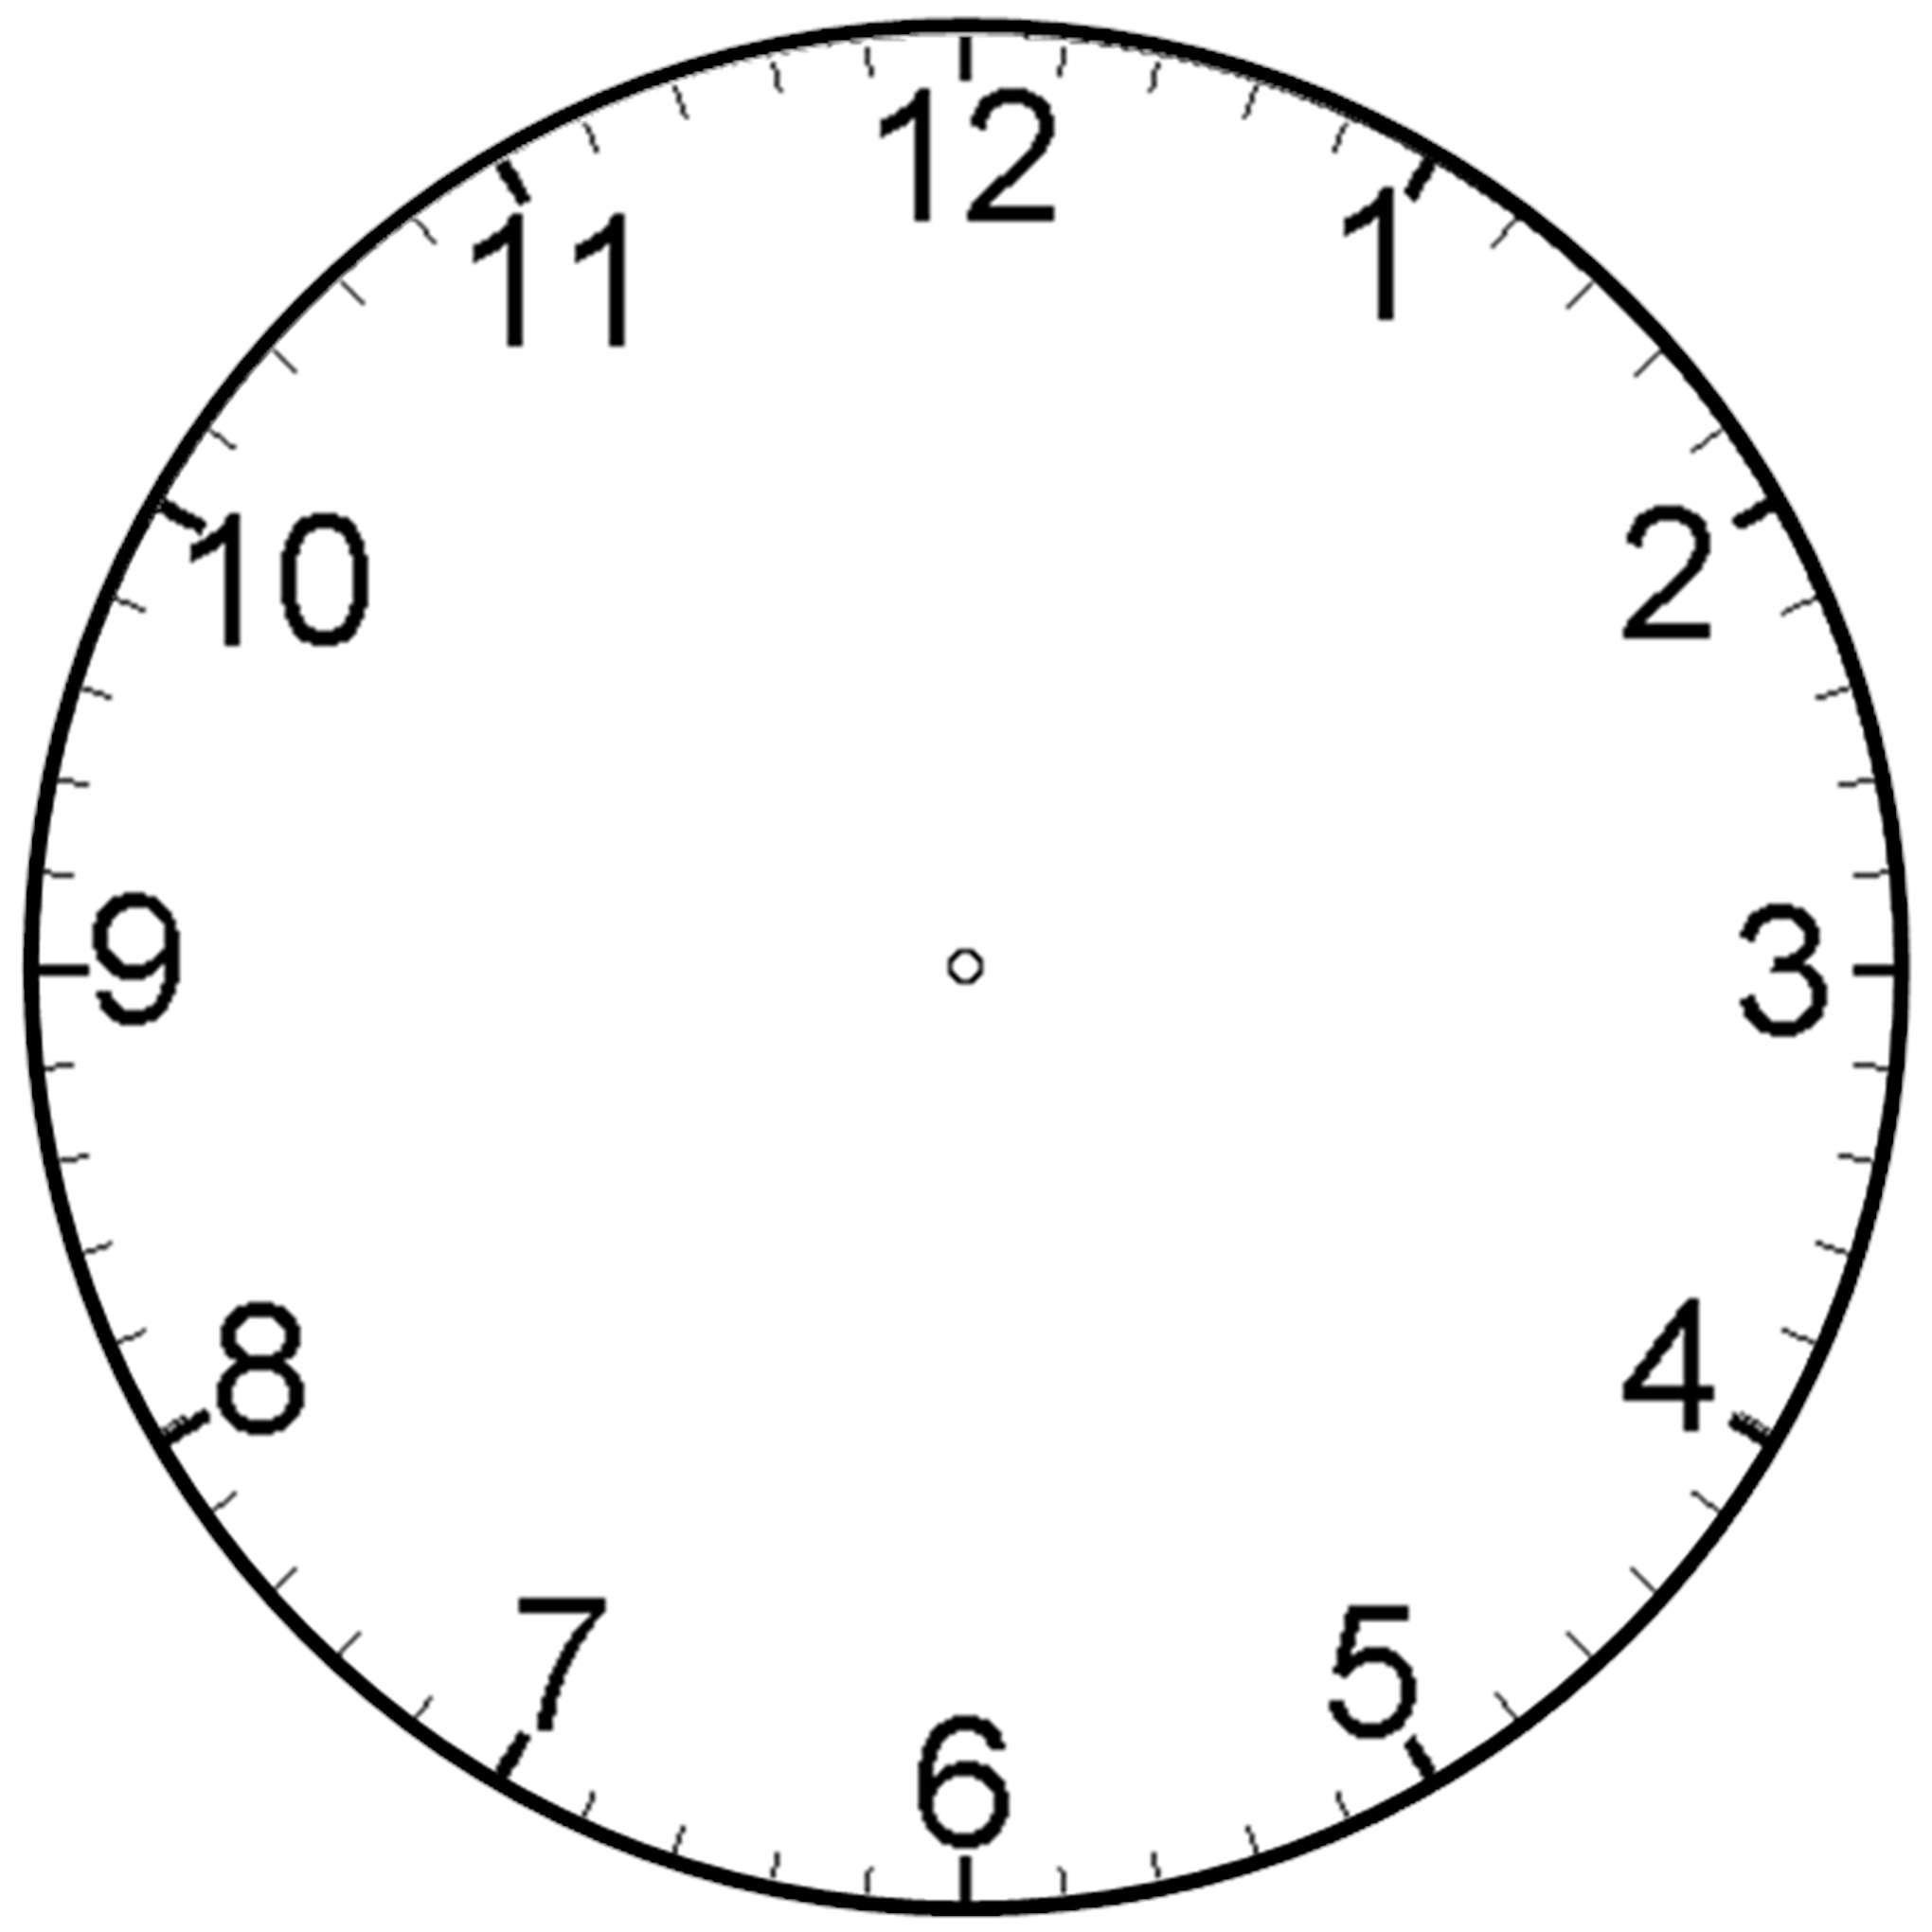 Printable Blank Clock Face - ClipArt Best